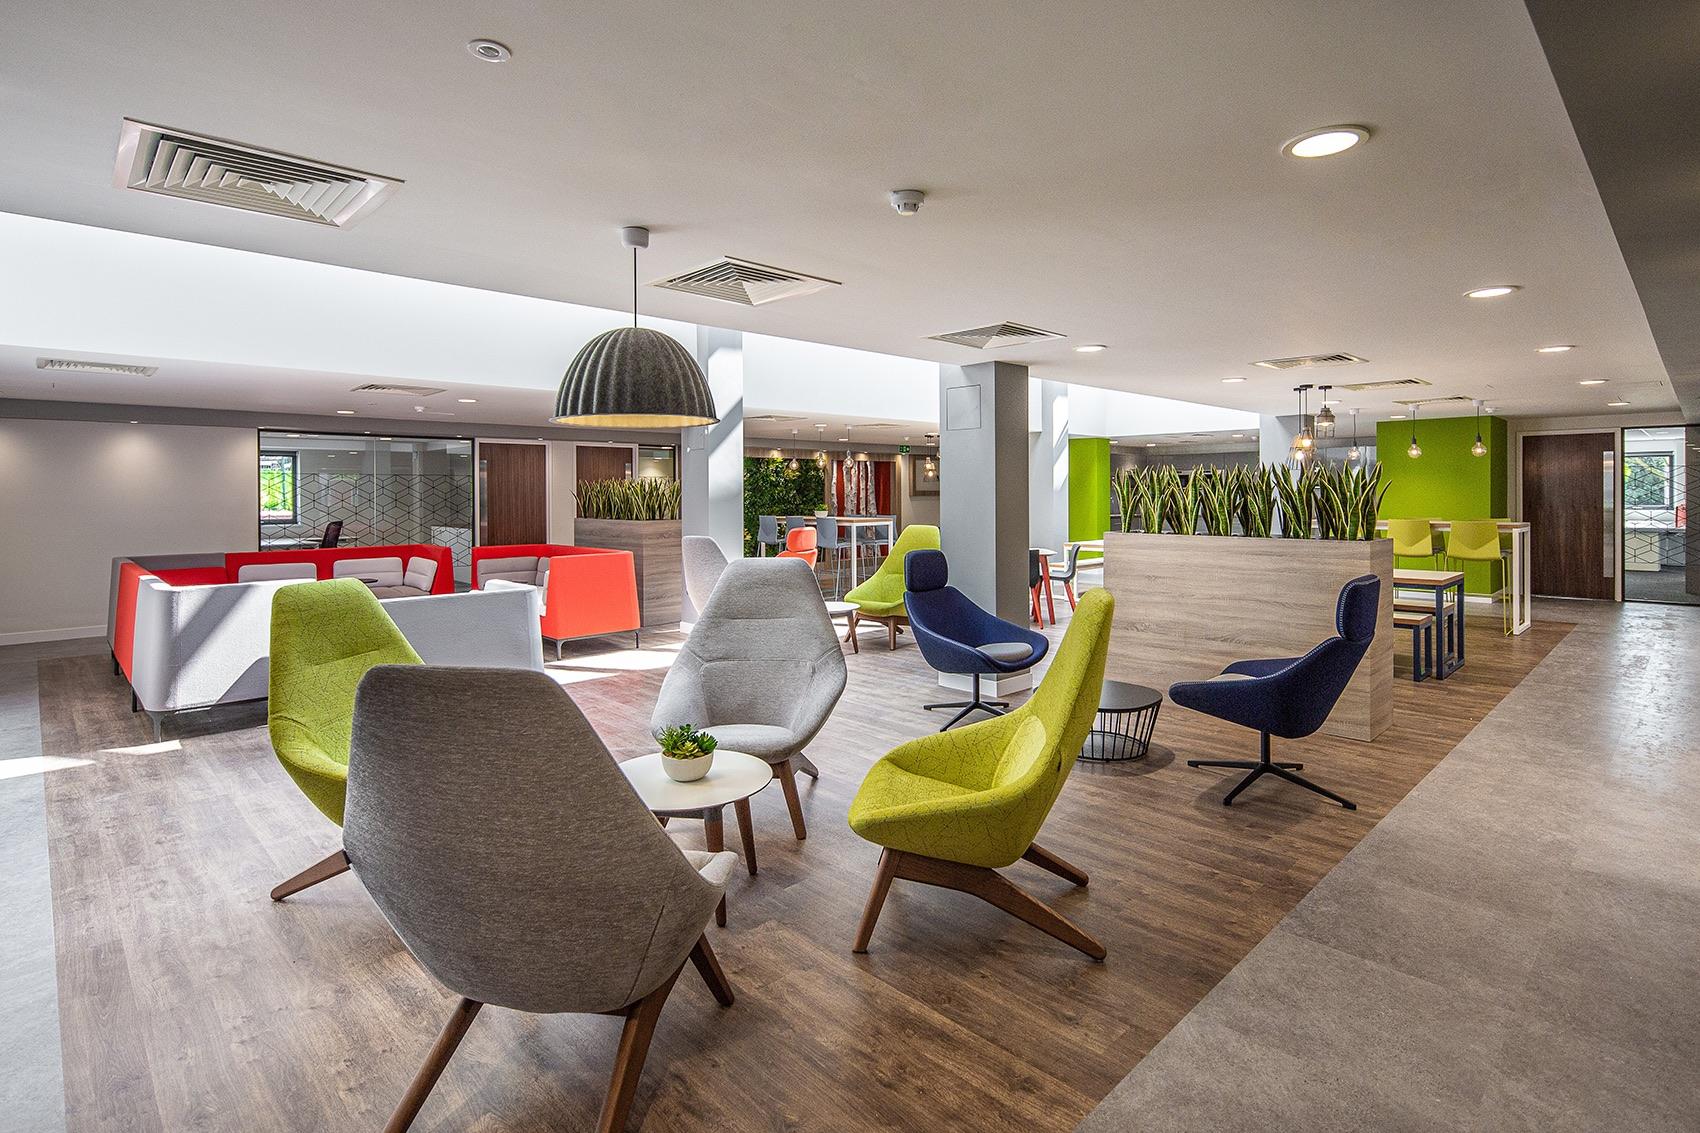 caunton-nottingham-office-5